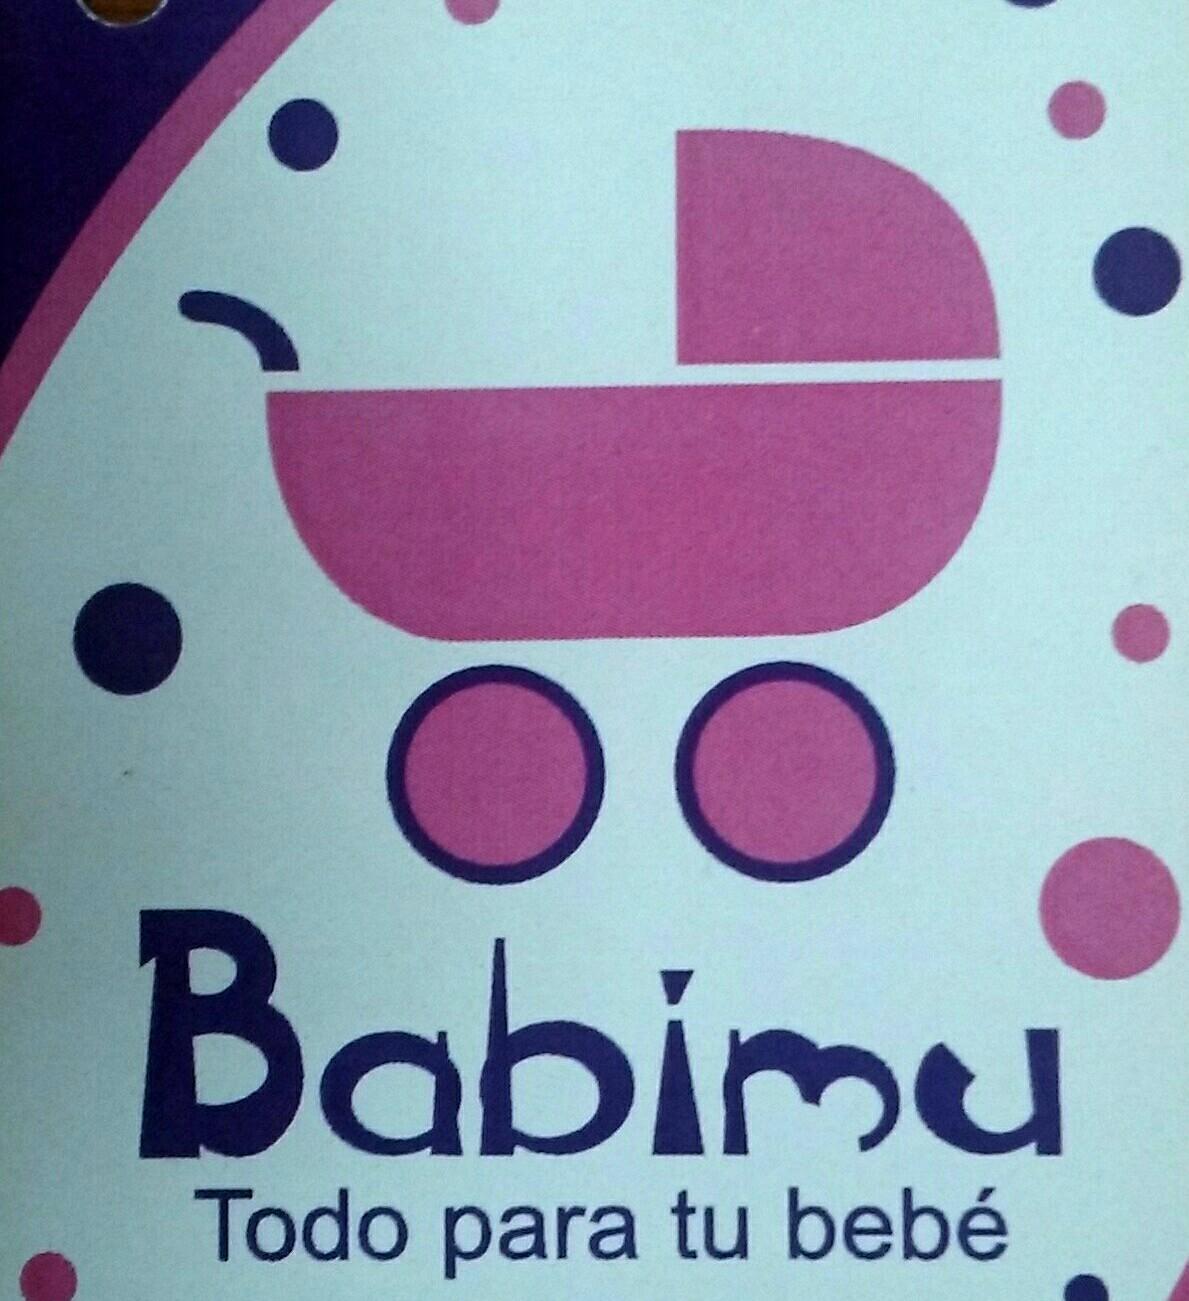 Bamibu bebe centerata - Milar chinales ...